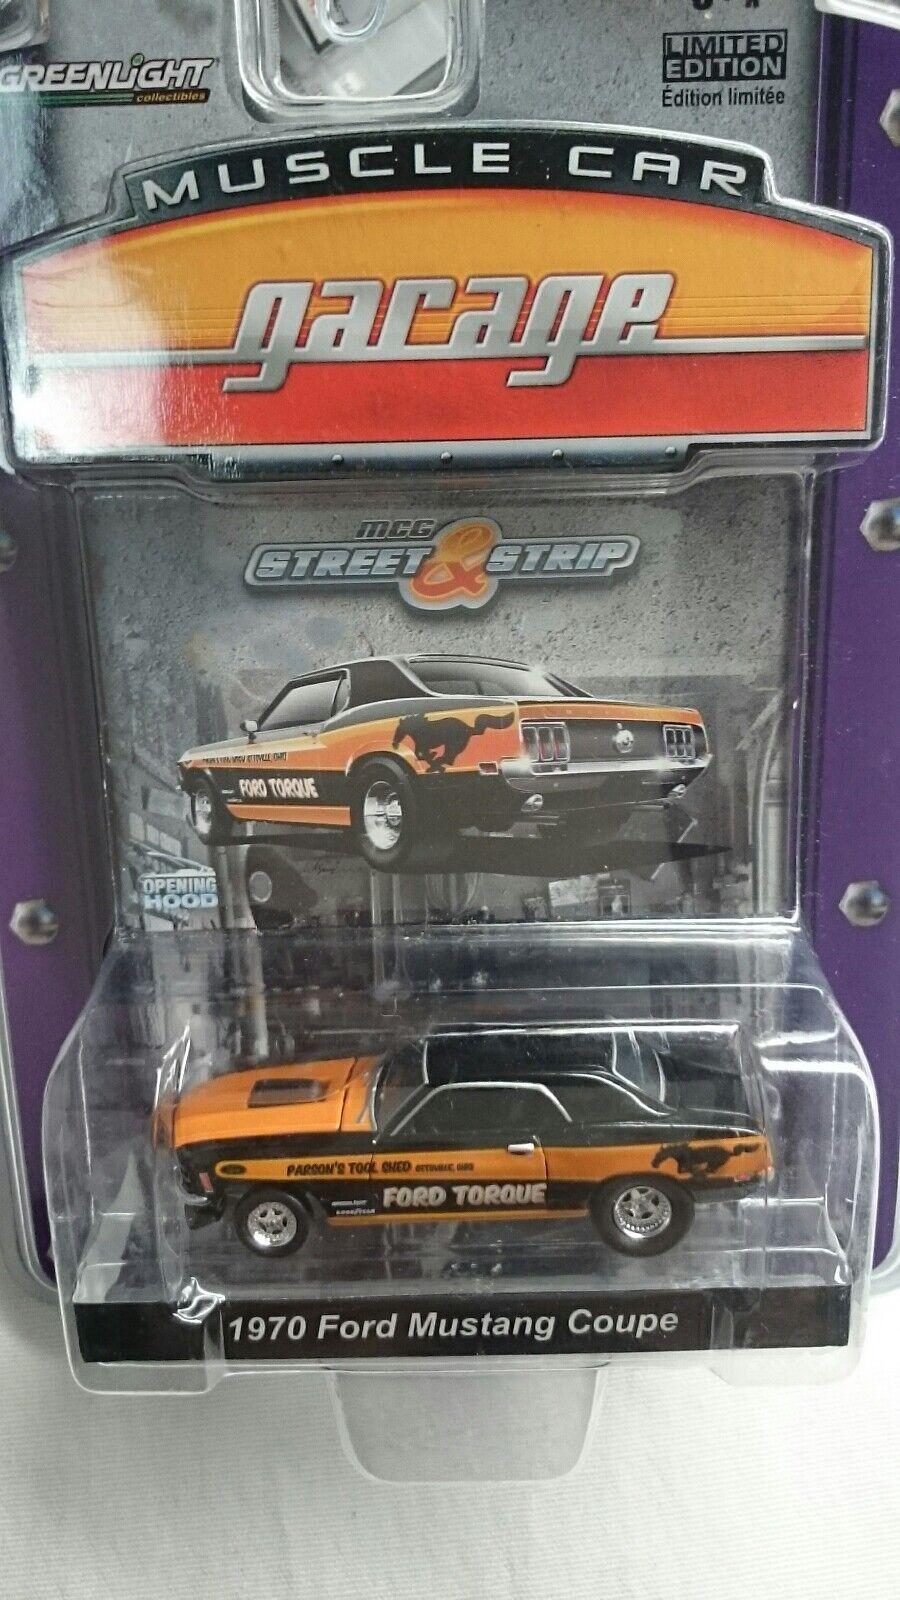 verdelight 1970 Ford Mustang Mustang Mustang Coupe mcg Street & Tira  RARA  como Nuevo Par Ford ac6f54